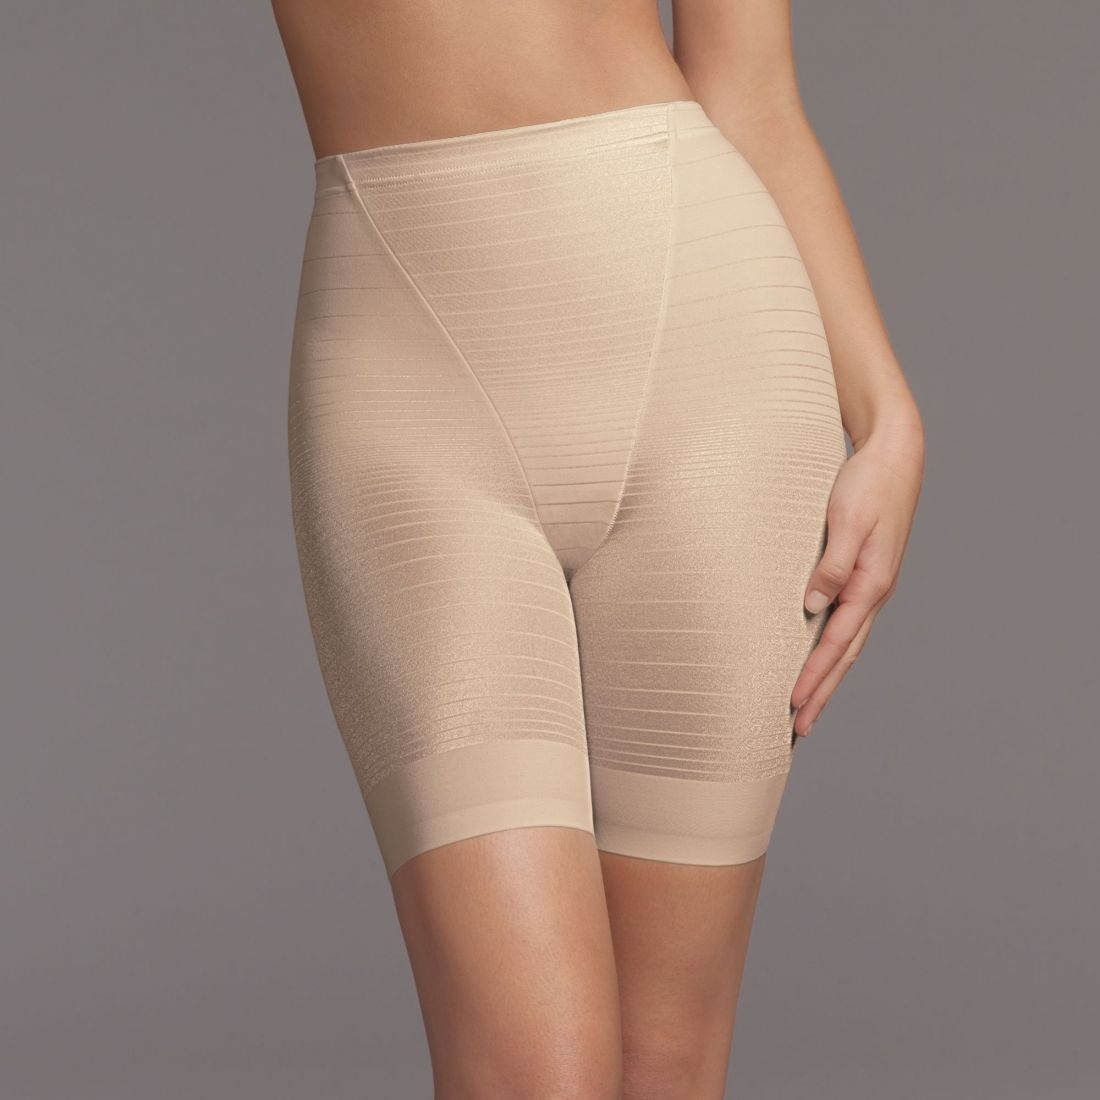 Под юбкой у женщины панталоны